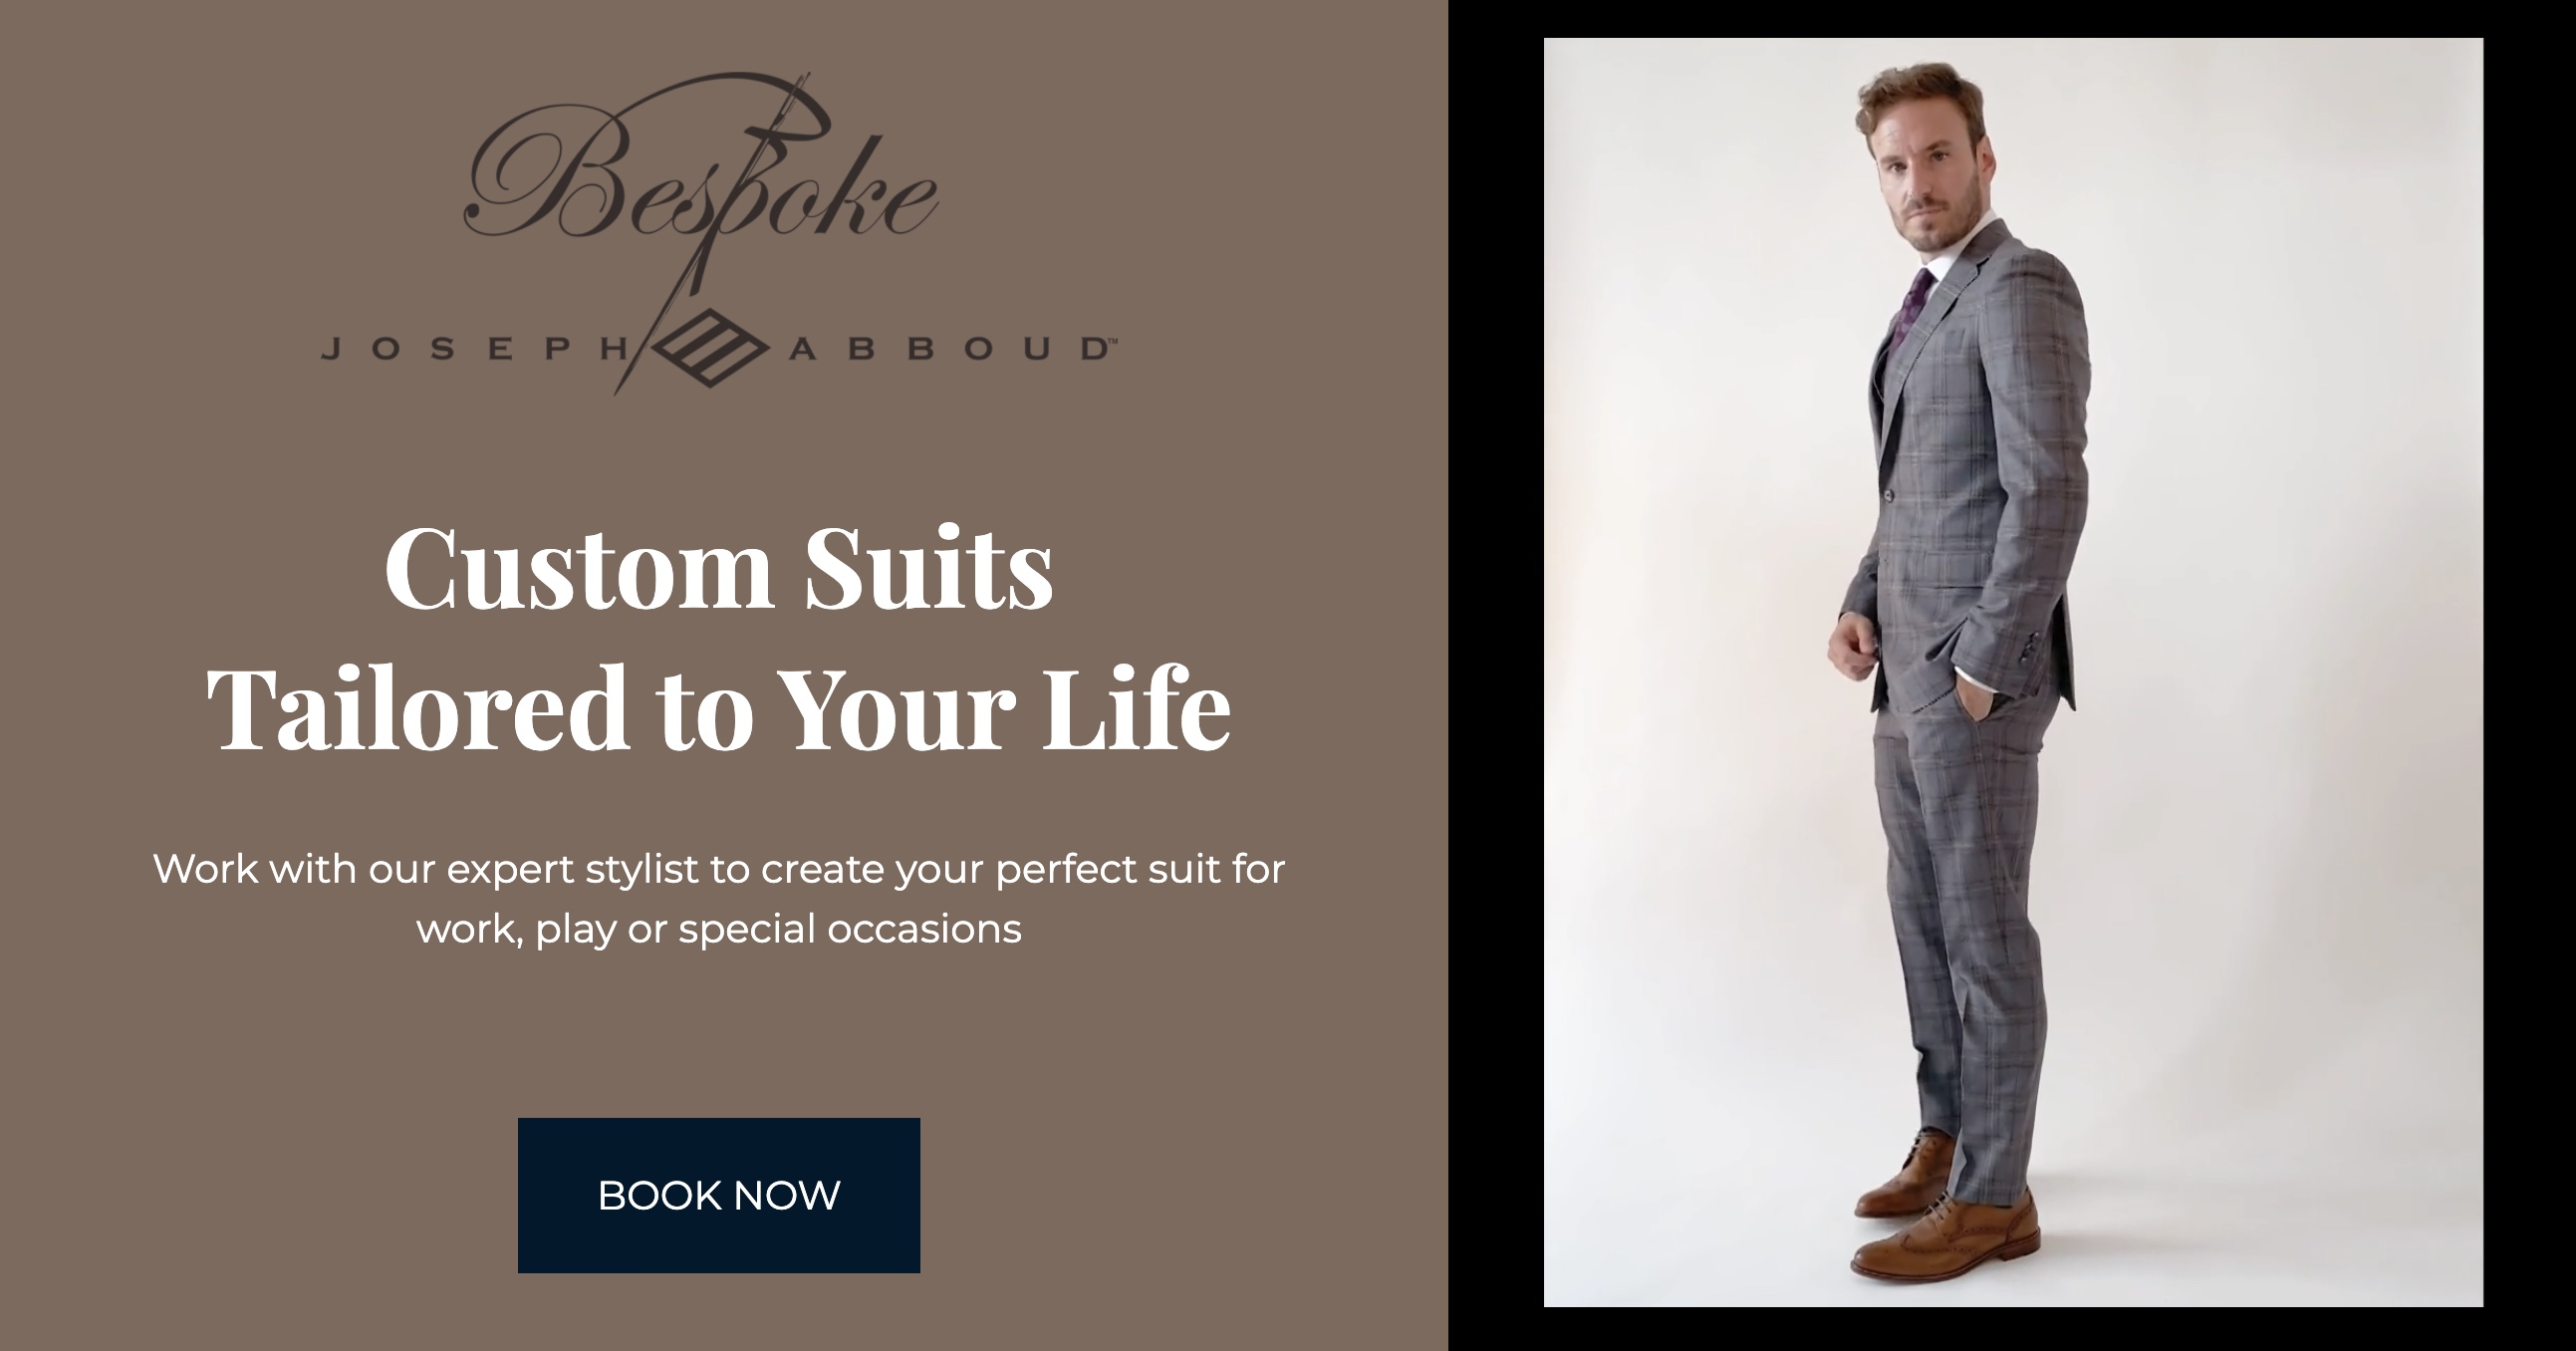 Joseph Abboud custom suits